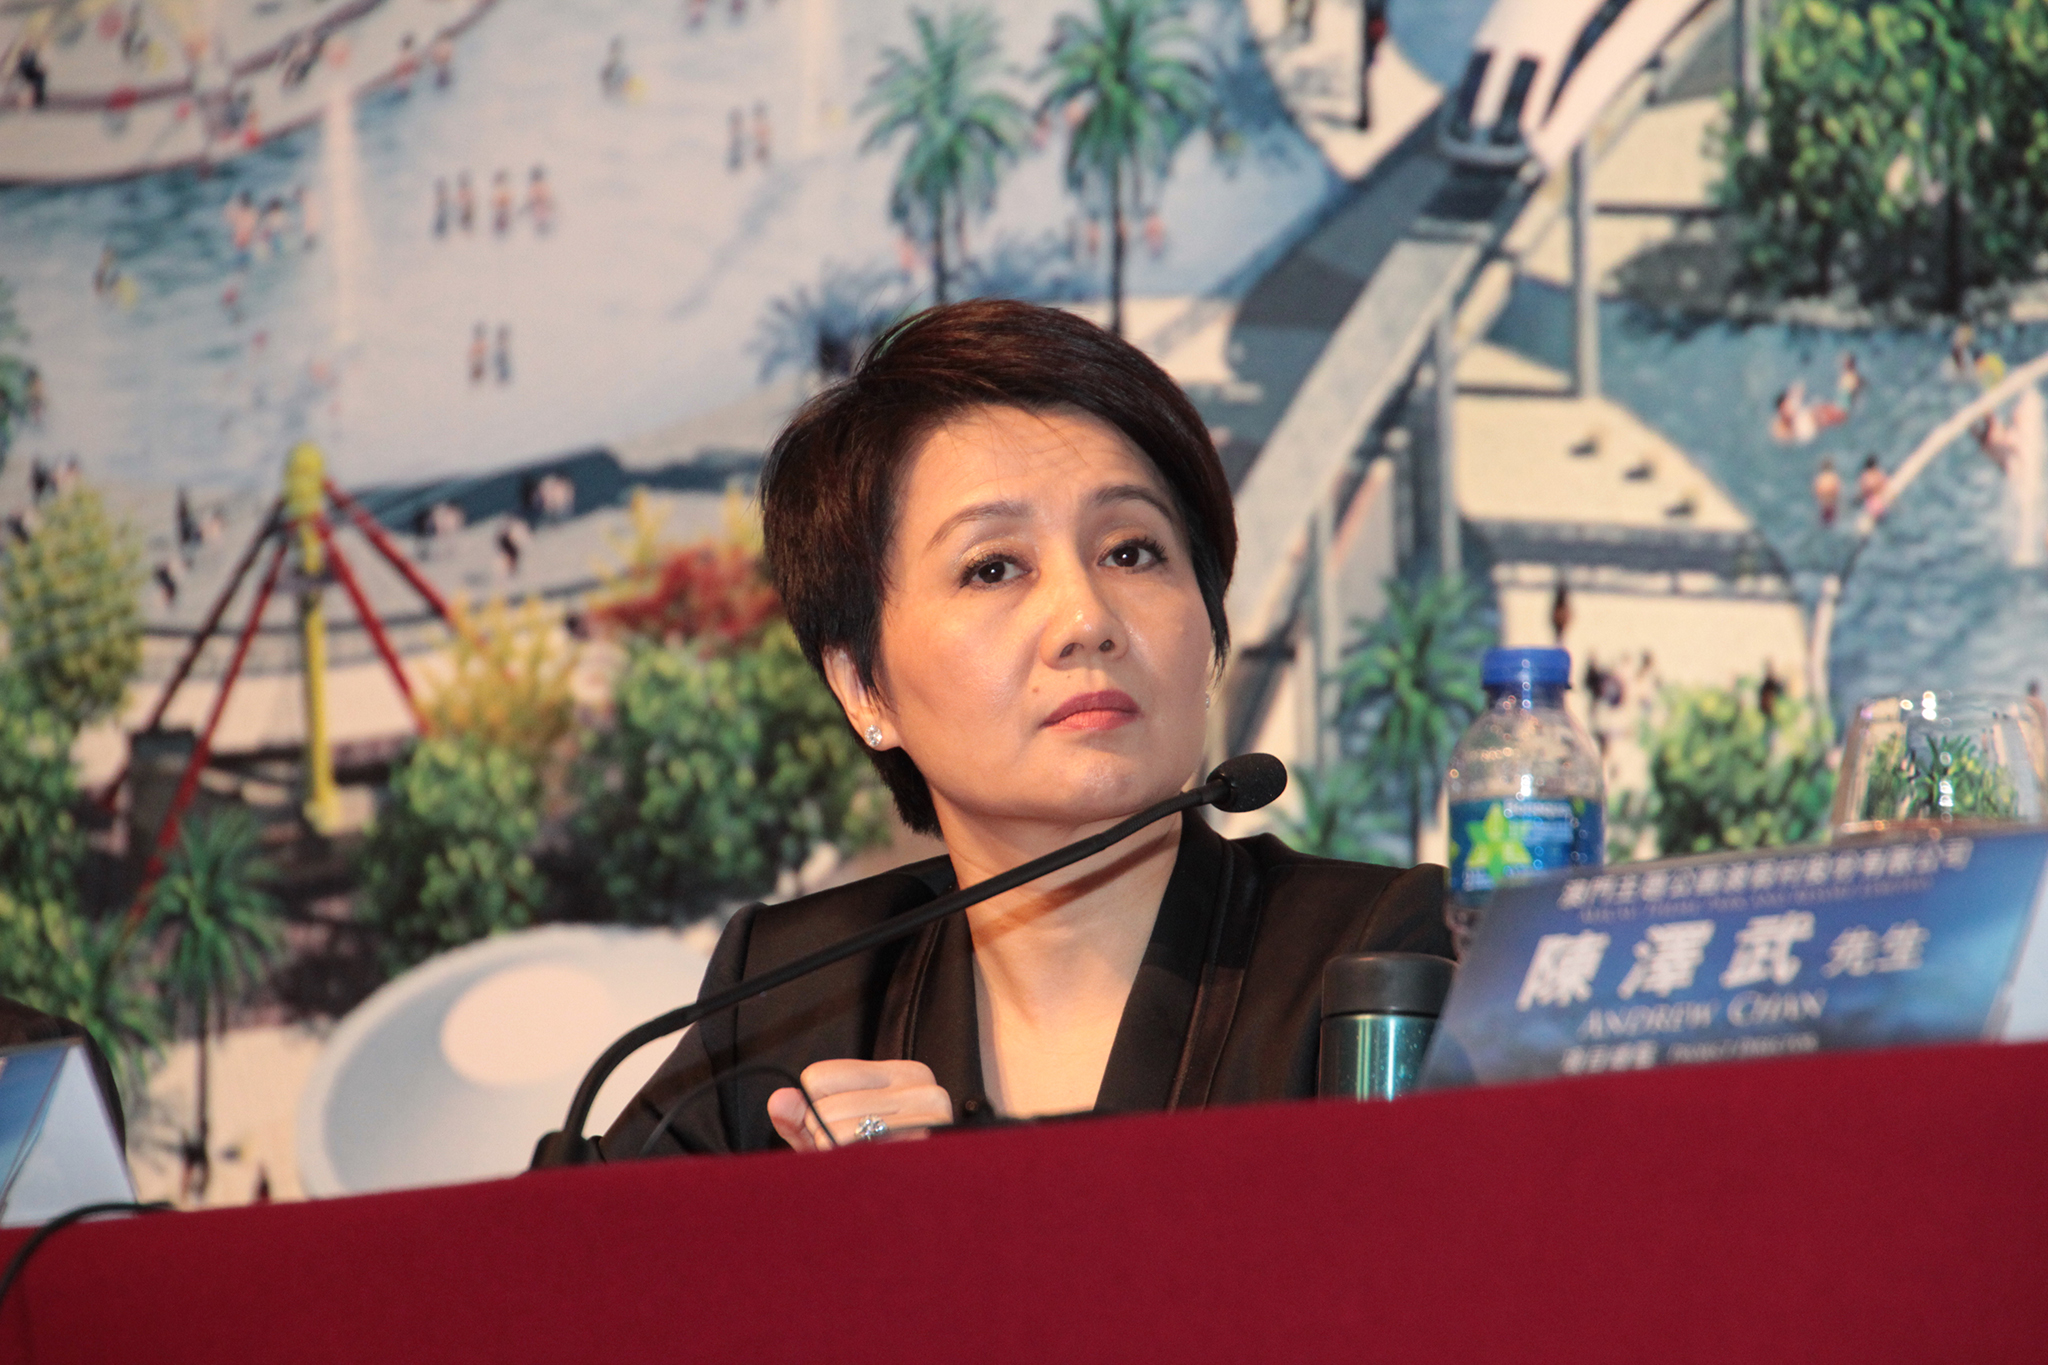 Macau royalty Angela Leong